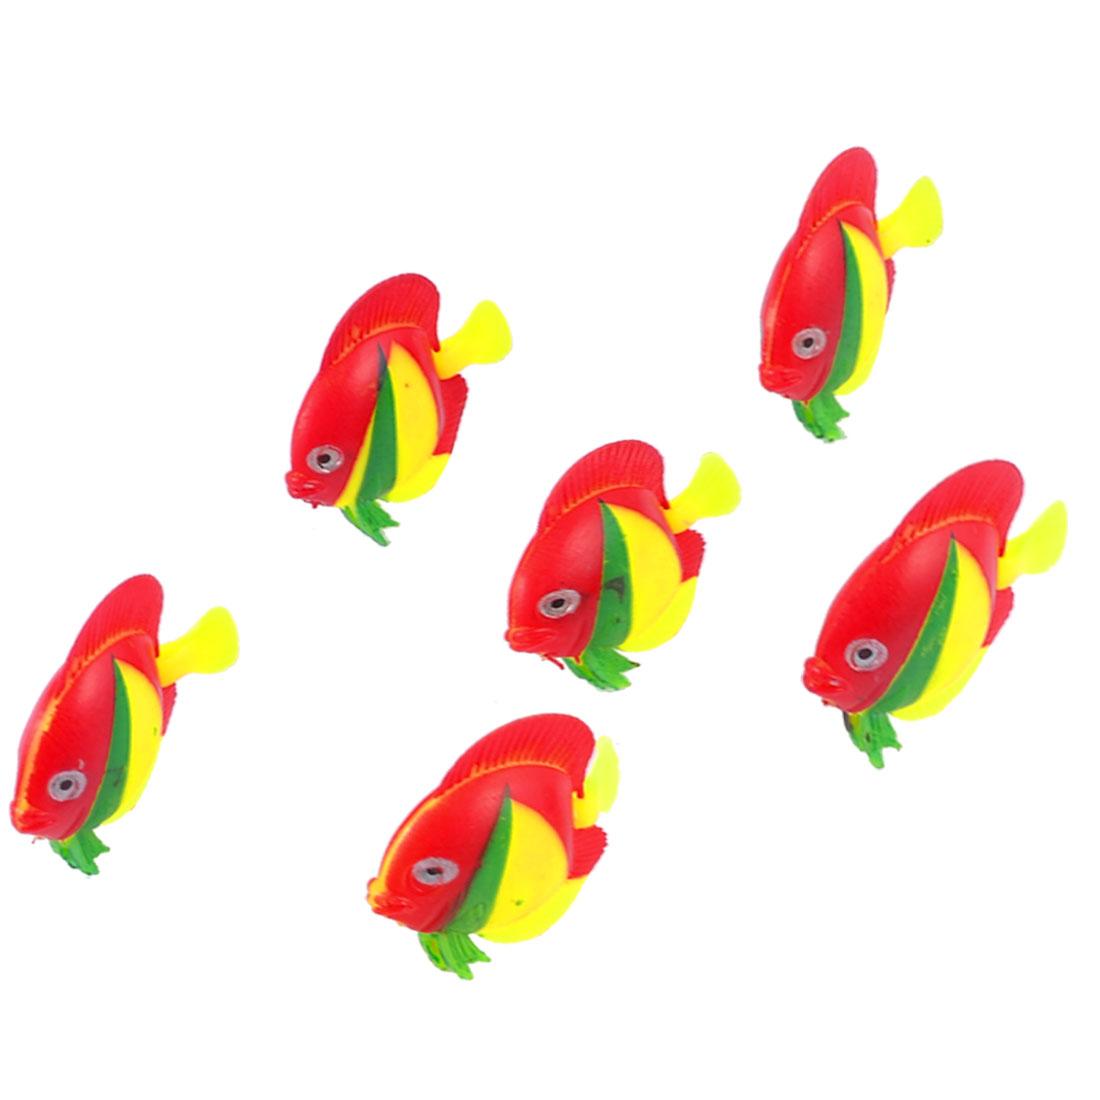 Wiggling Tail 3 Colors Plastic Fishes Aquarium Fish Tank Decor 6 Pcs